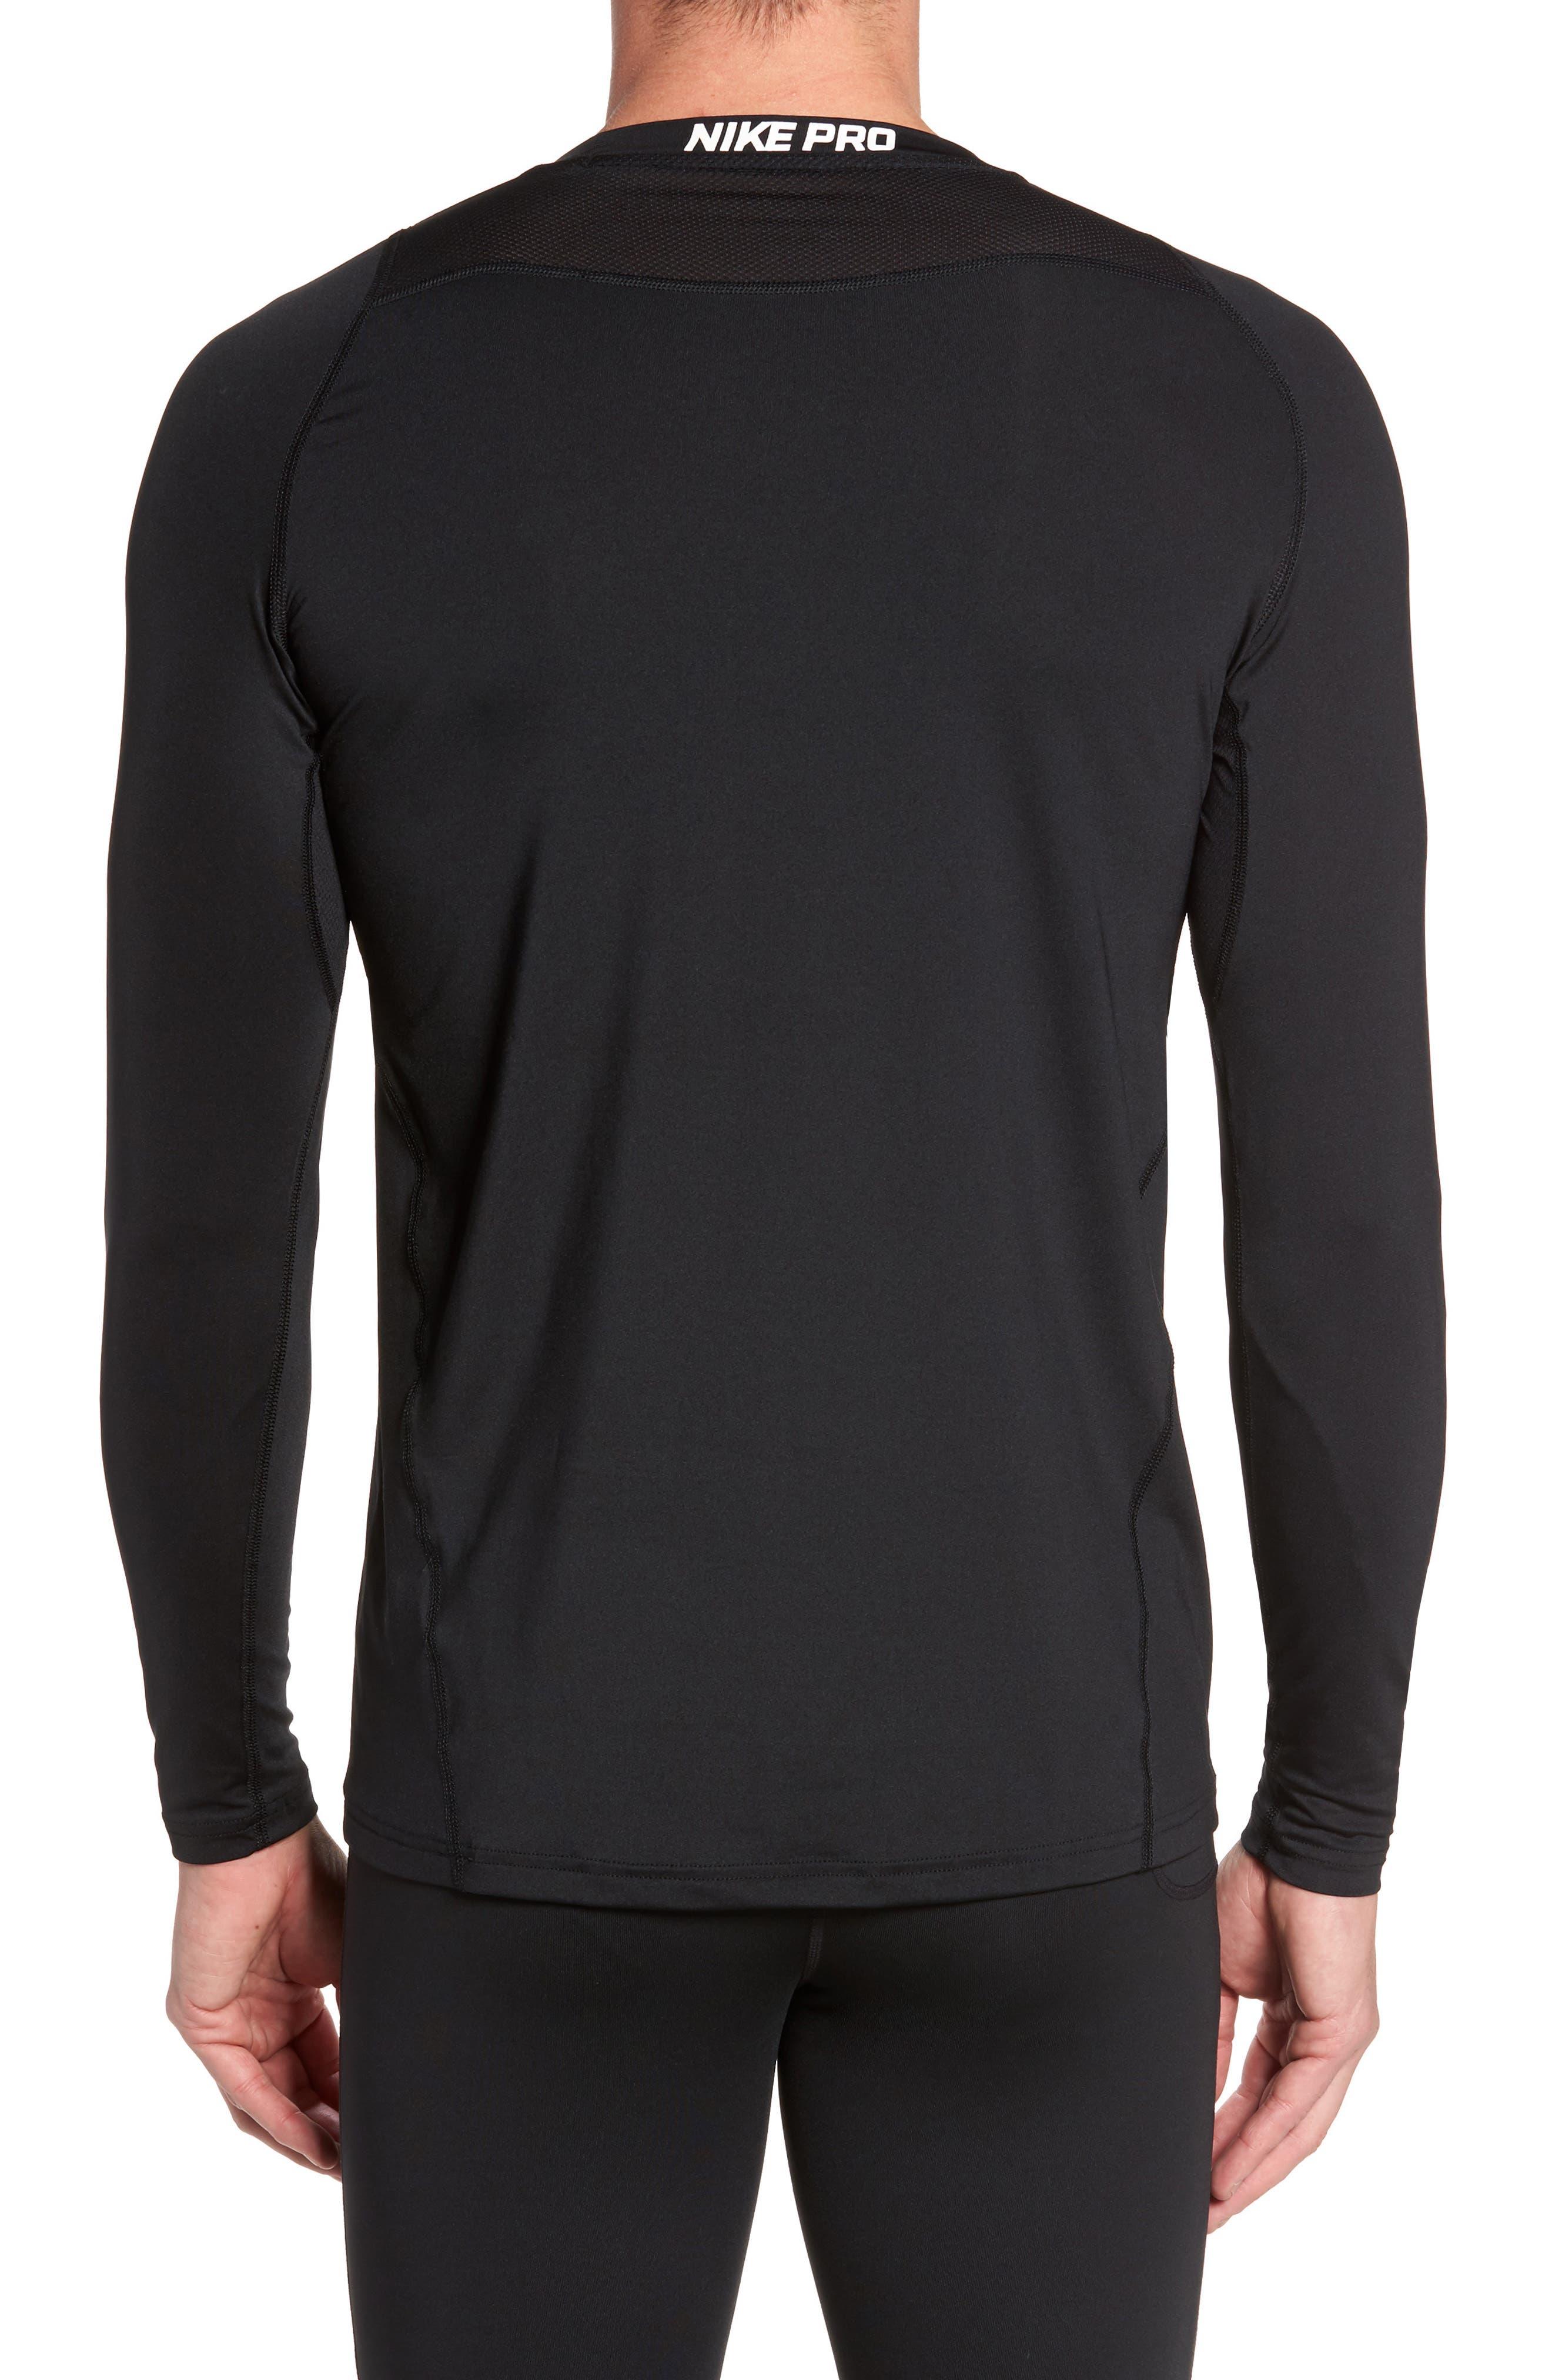 Pro Fitted Performance T-Shirt,                             Alternate thumbnail 2, color,                             BLACK/ WHITE/ WHITE